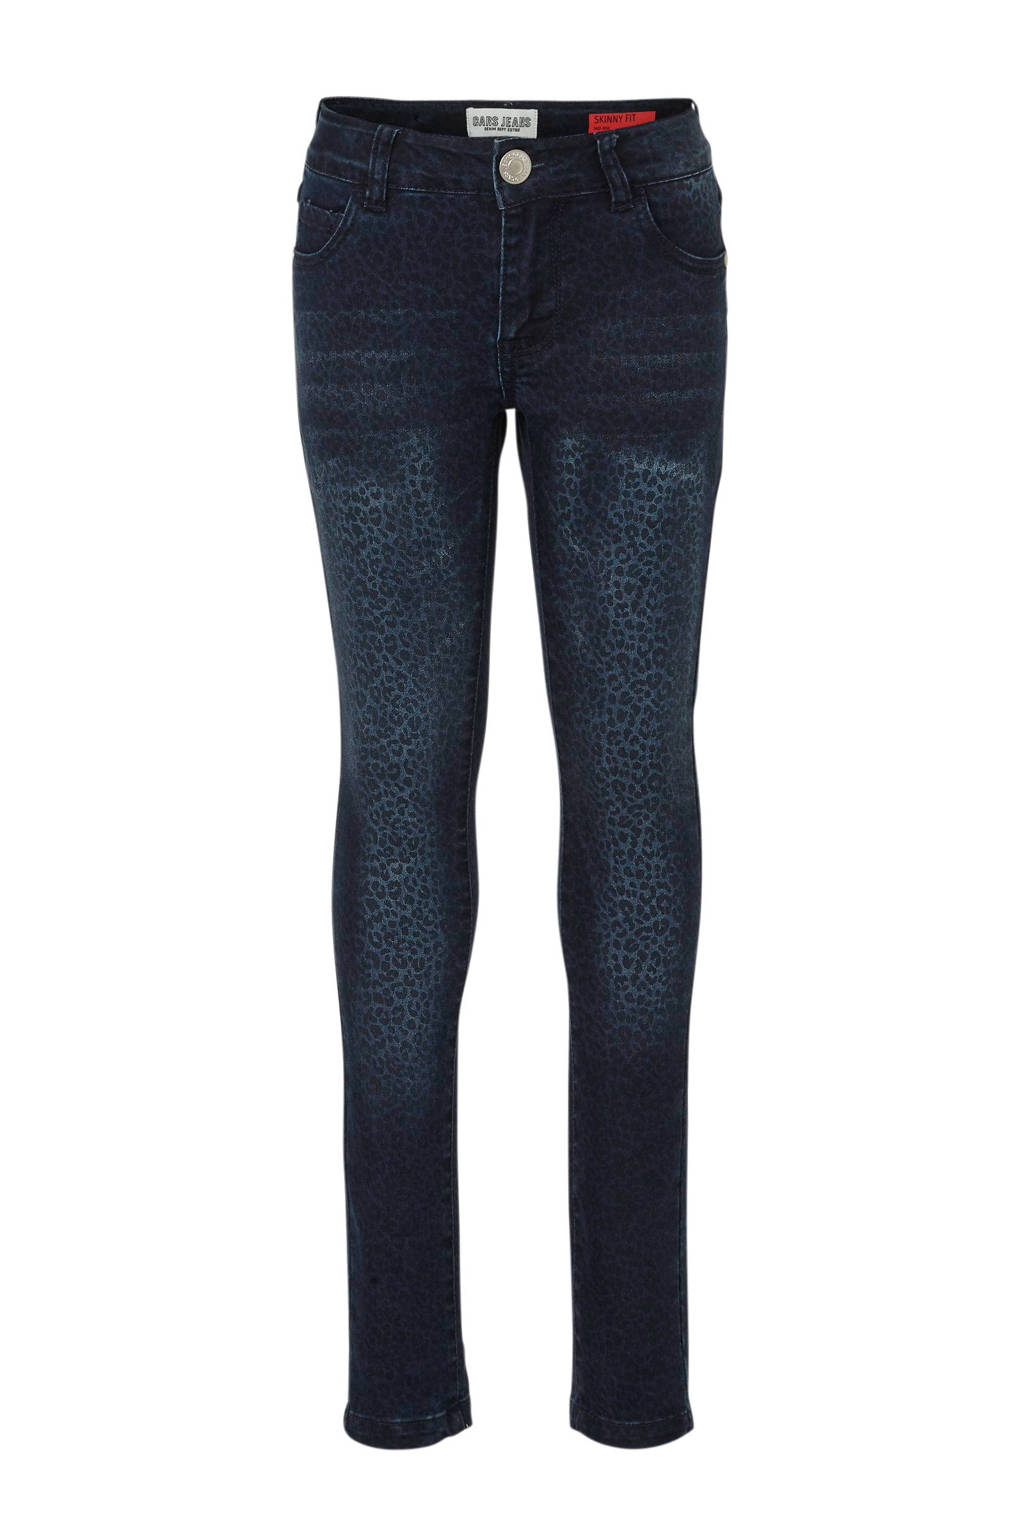 Cars skinny jeans Razia met panterprint dark used, Dark used